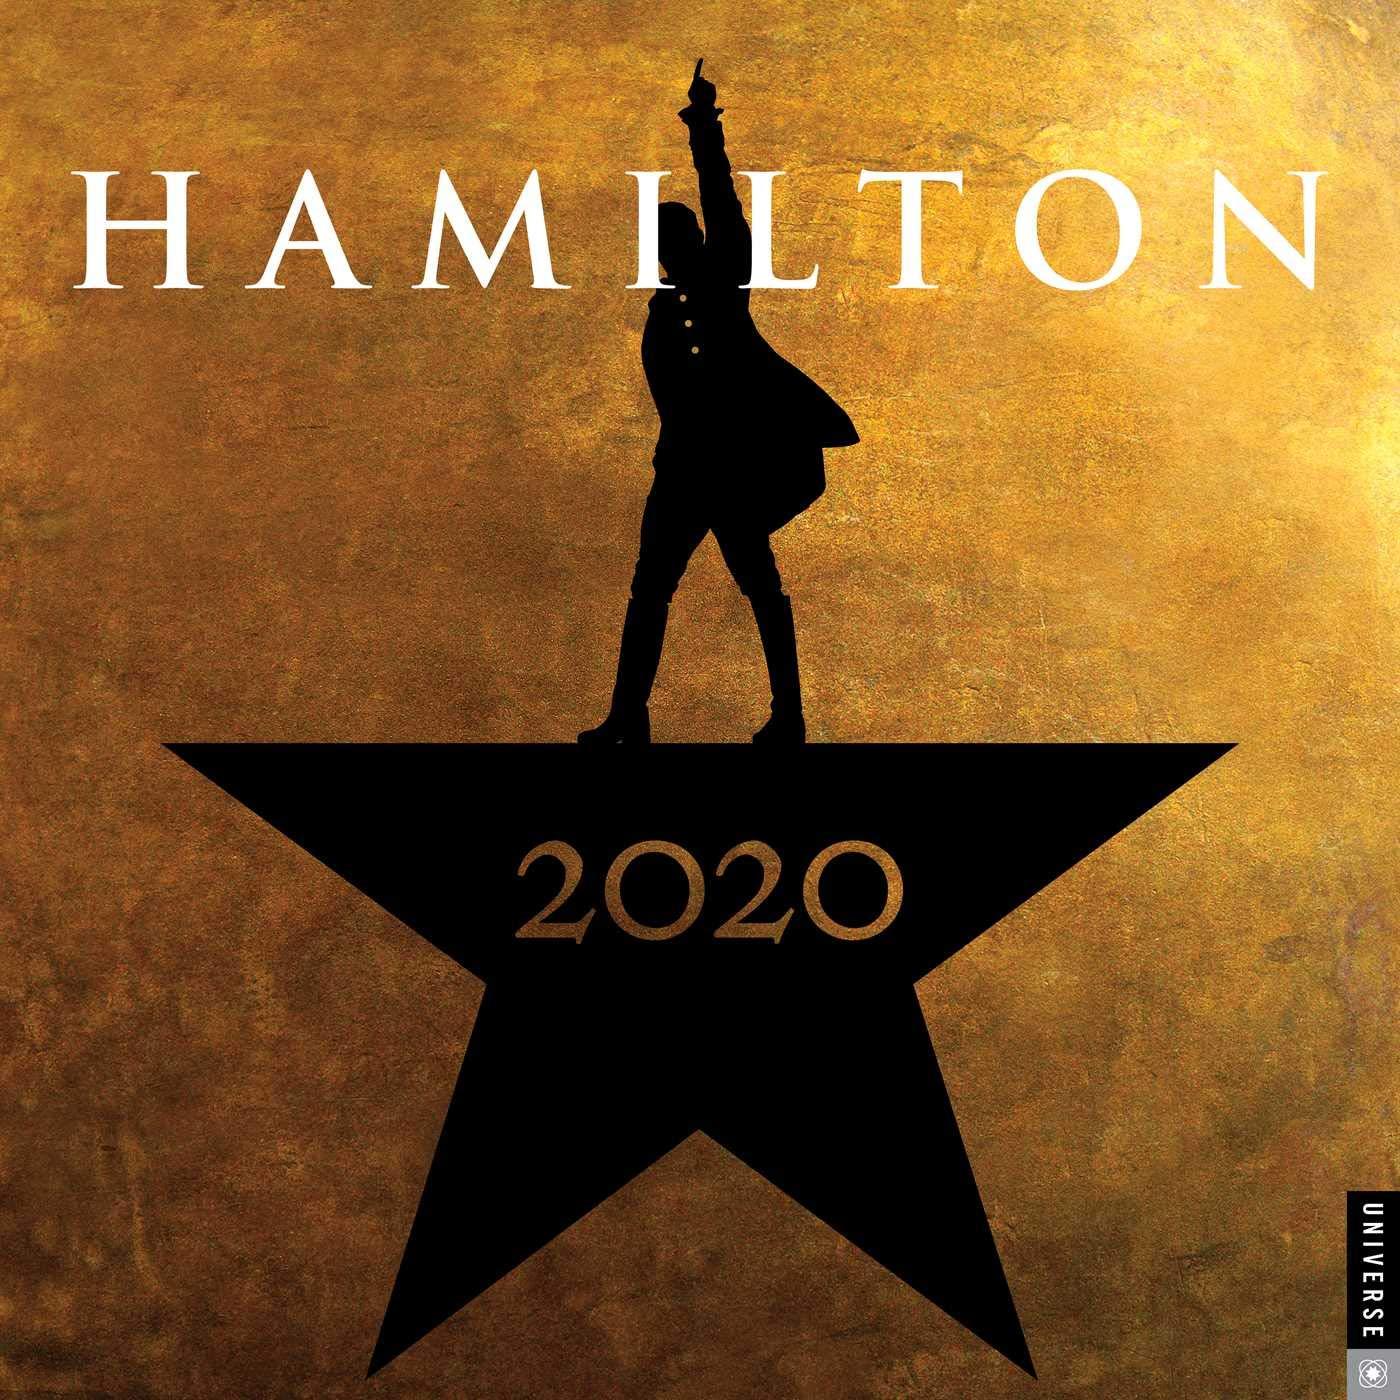 Broadway Calendar 2020 Hamilton 2020 Wall Calendar: Hamilton Uptown LLC: 9780789336071